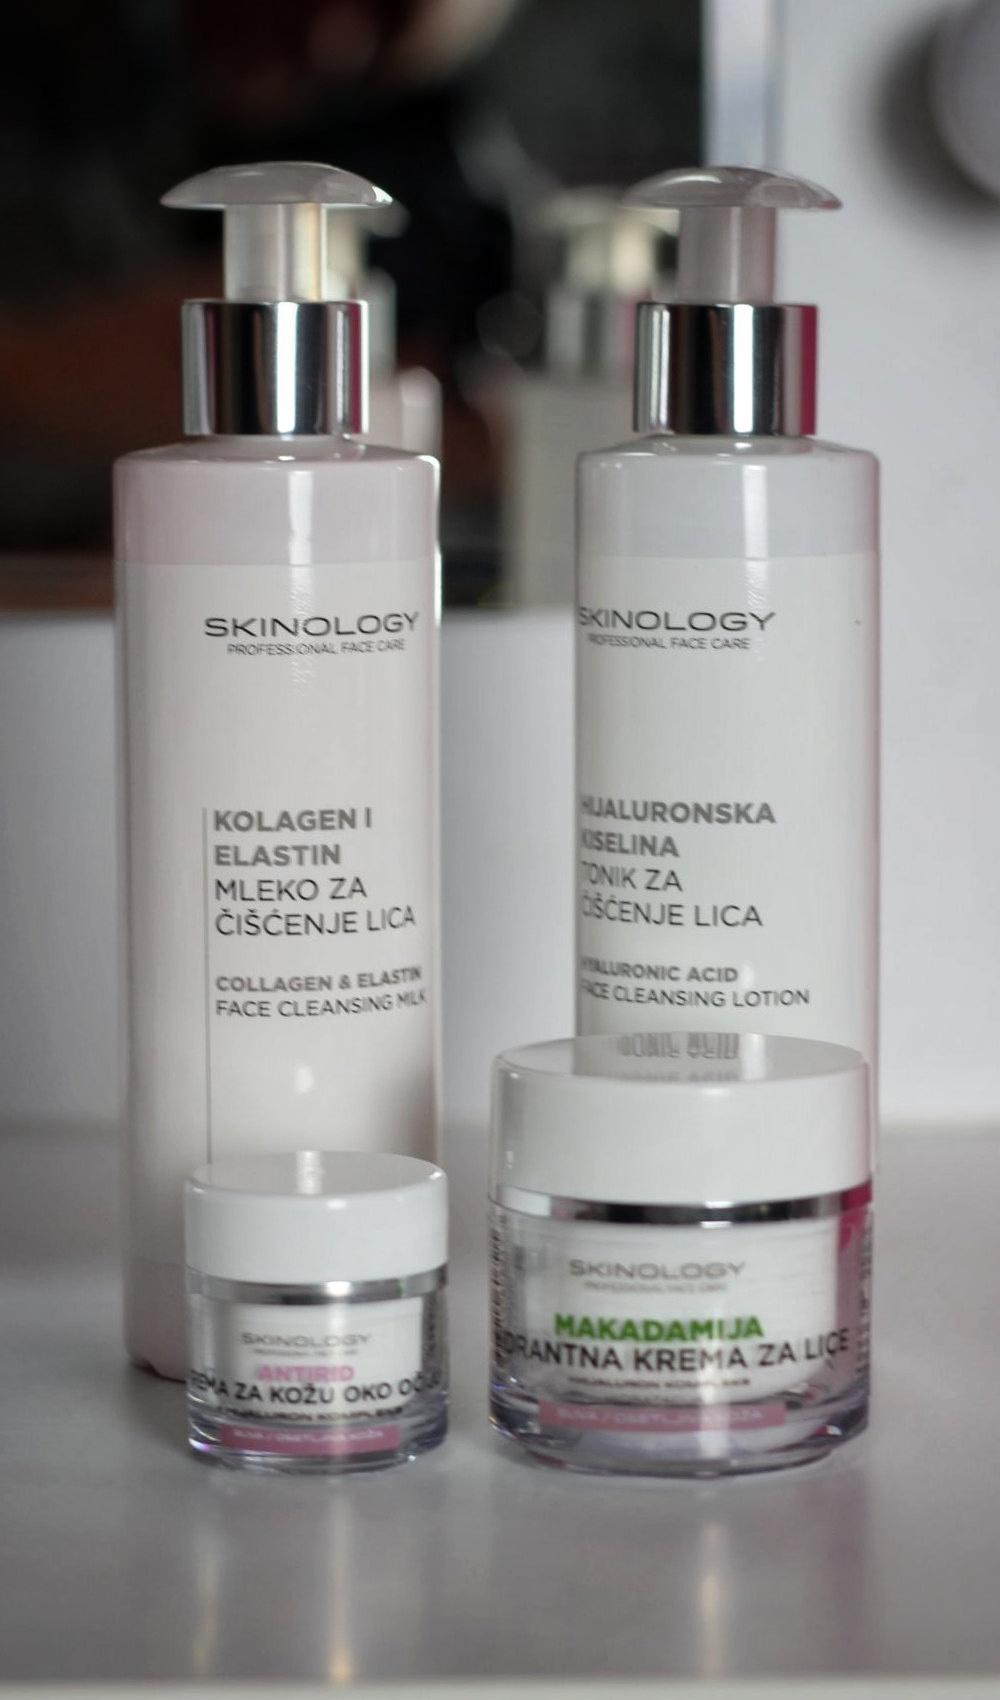 Elastin Skin Care Products